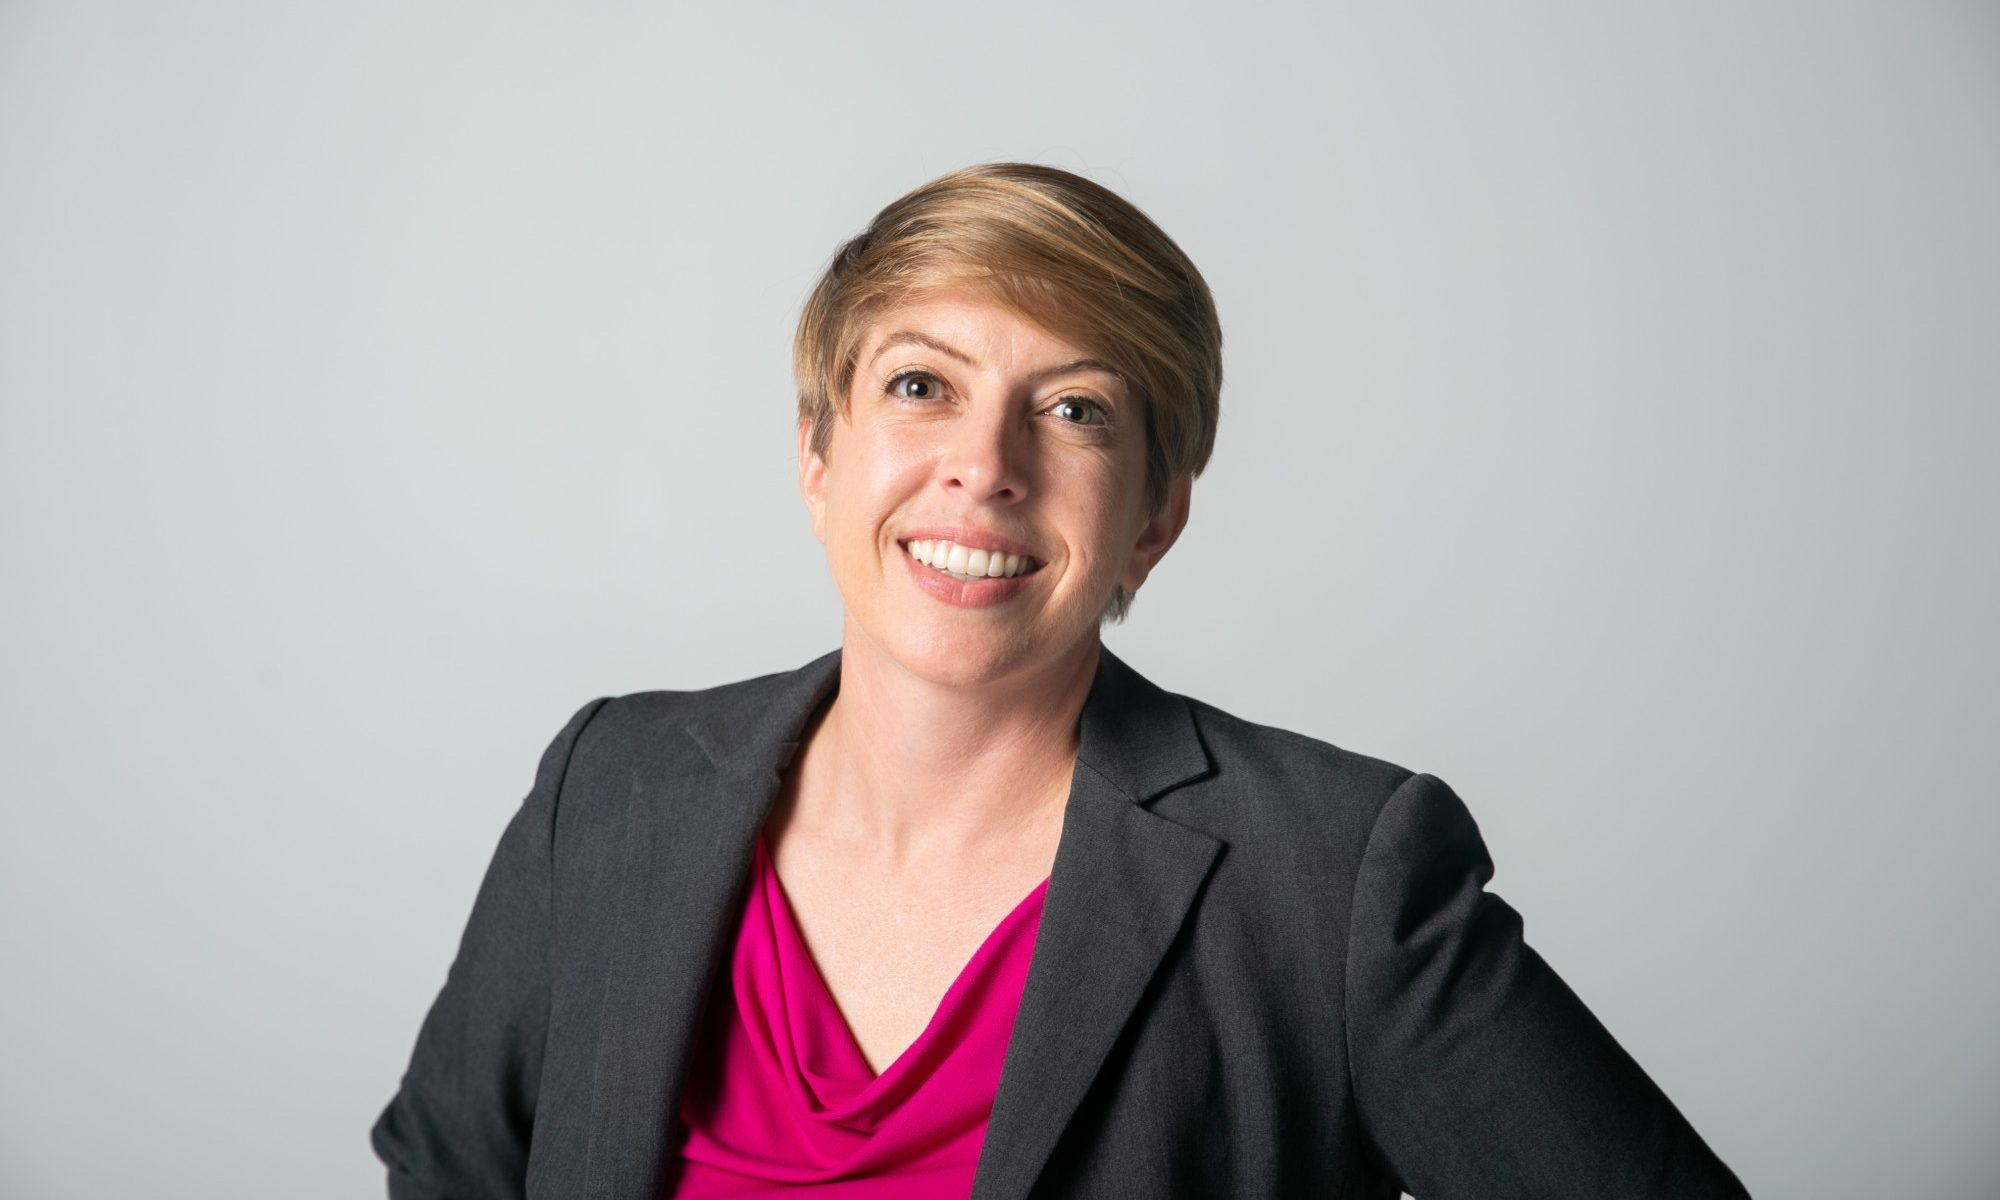 Q&A: Marni von Wilpert, candidate for San Diego City Council District 5